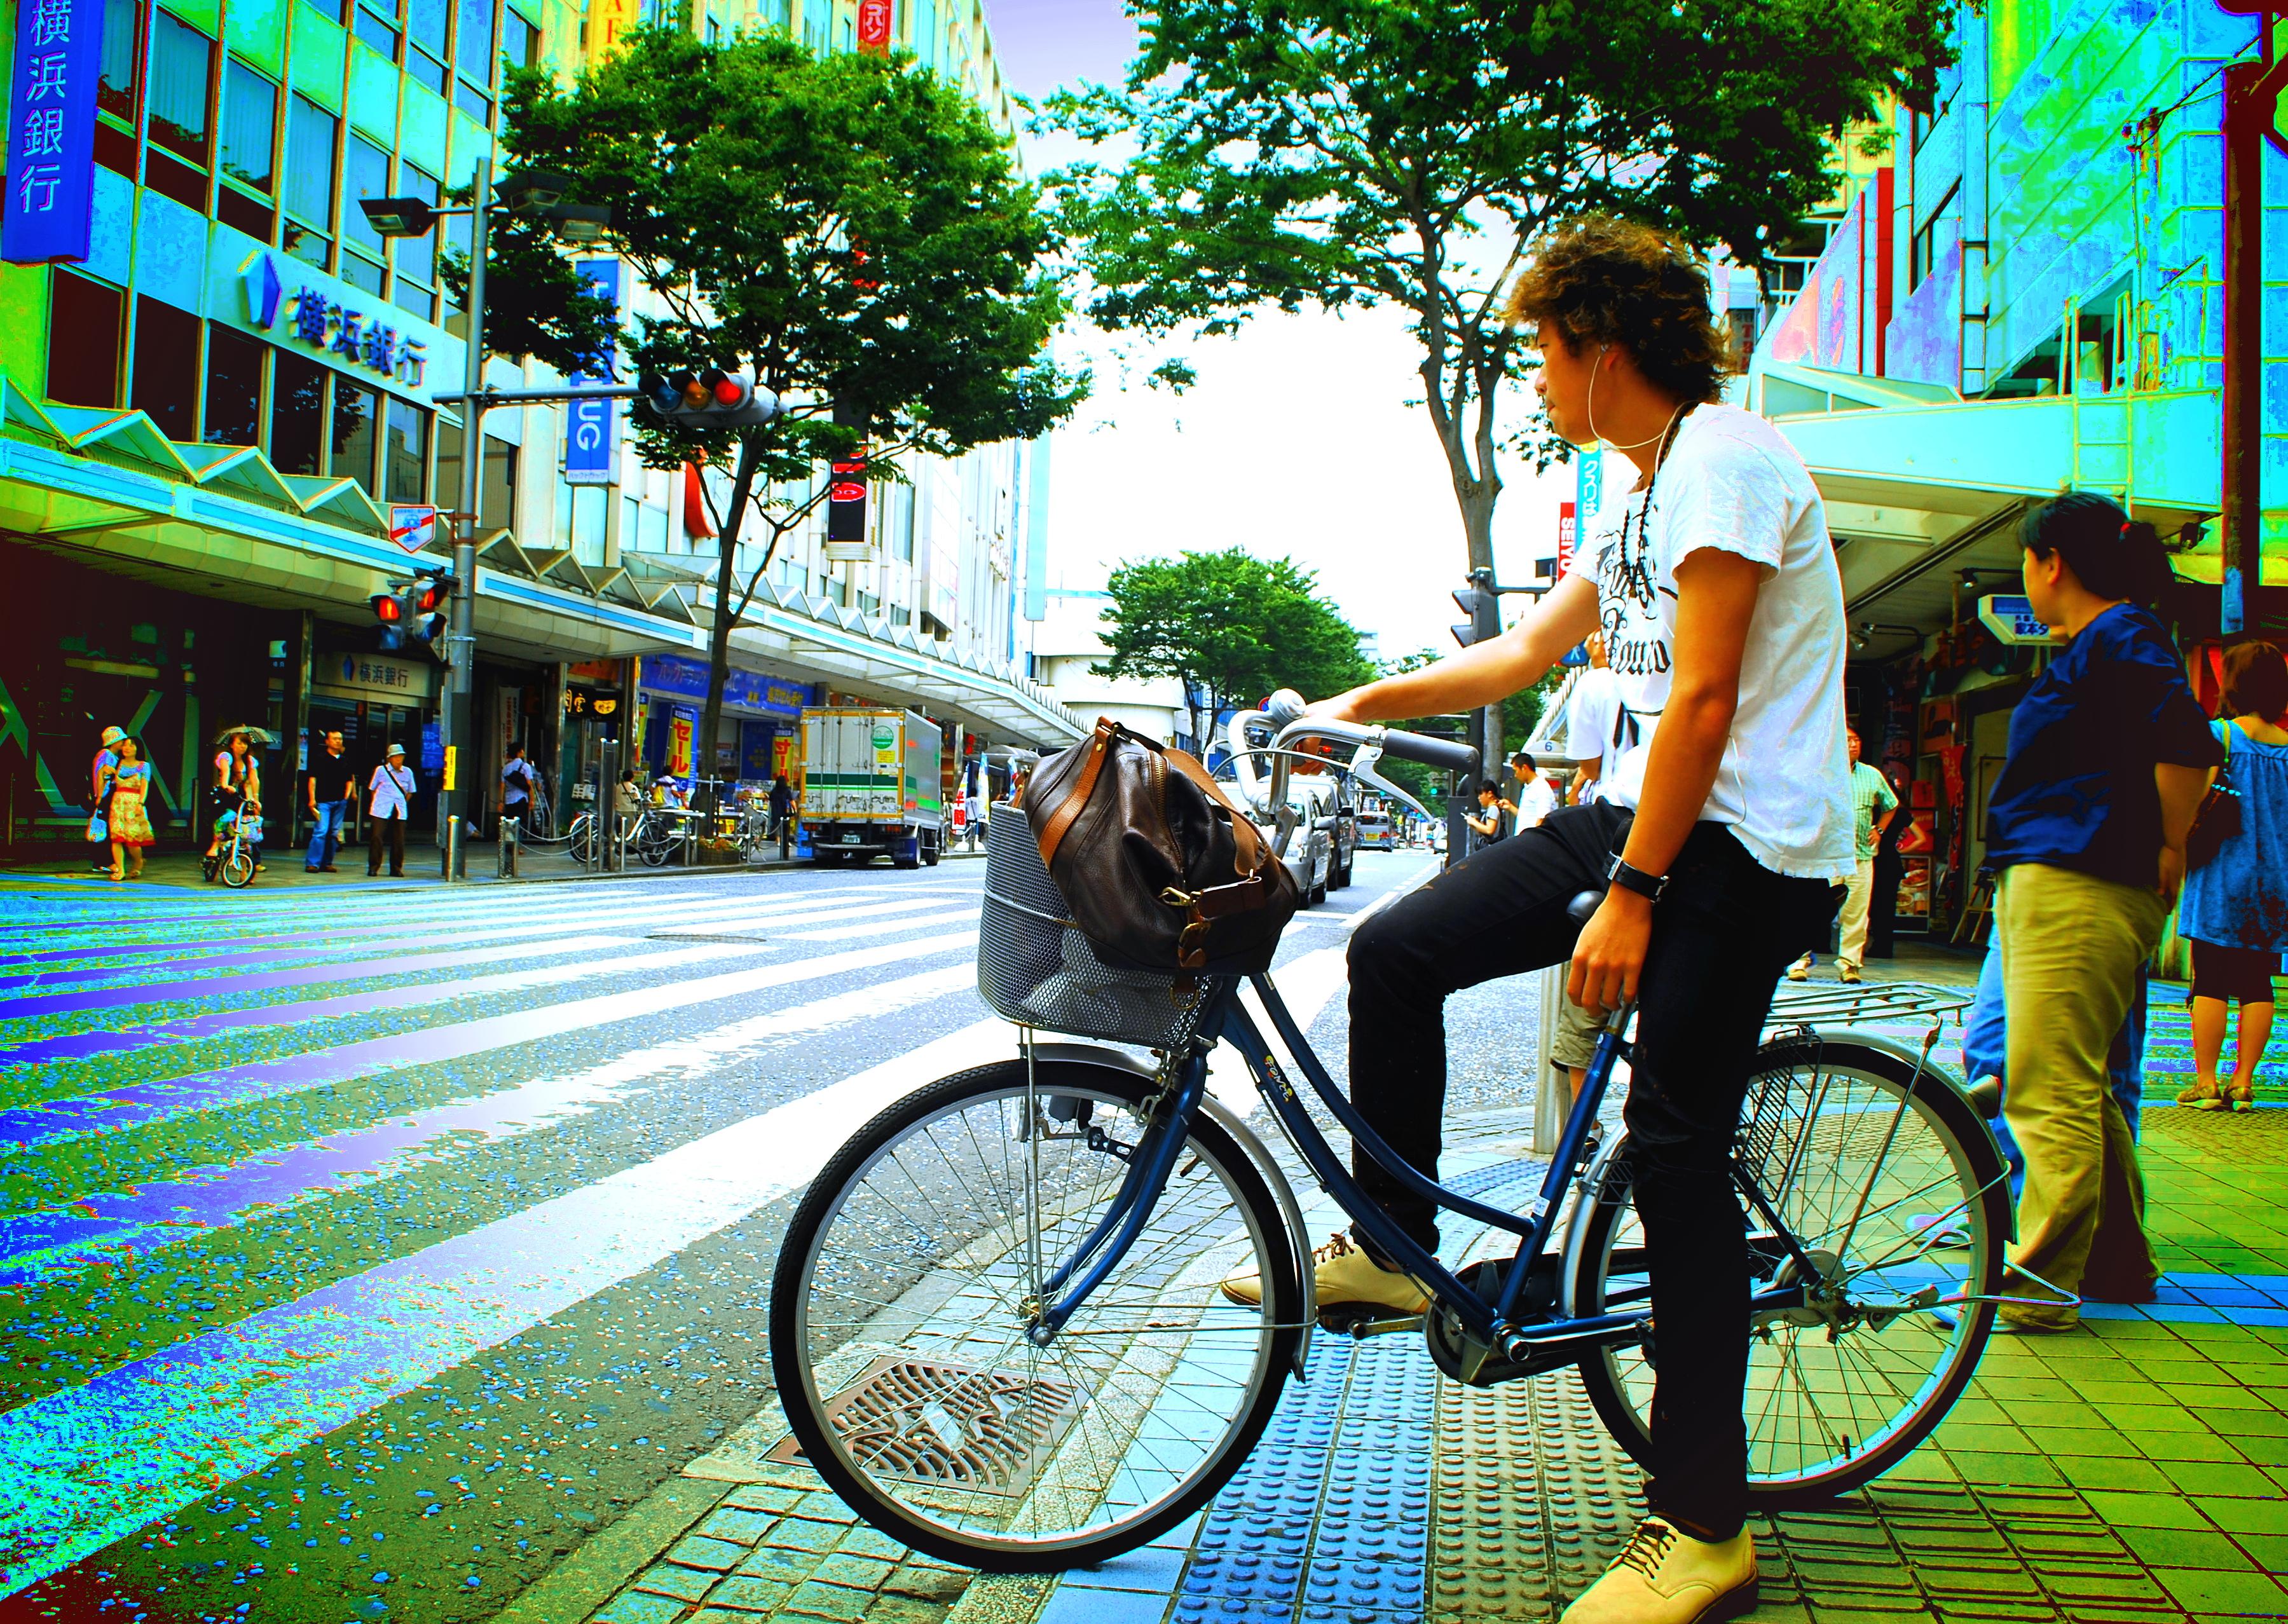 Easy Rider, Bicycle, Man, Traffic, Teen, HQ Photo